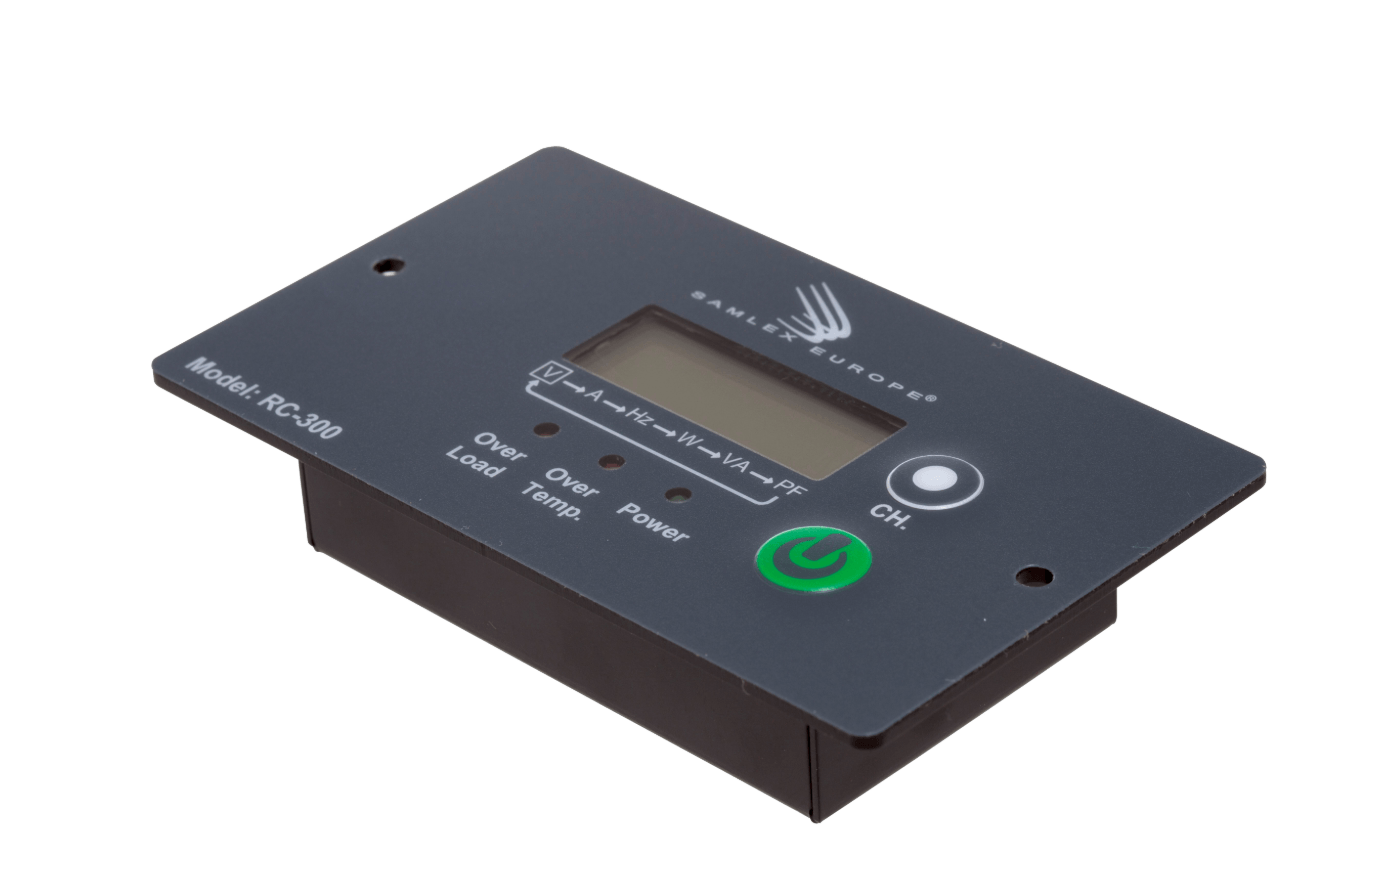 remote on/of met 6m kabel tbv SWI 1600/2100/3000